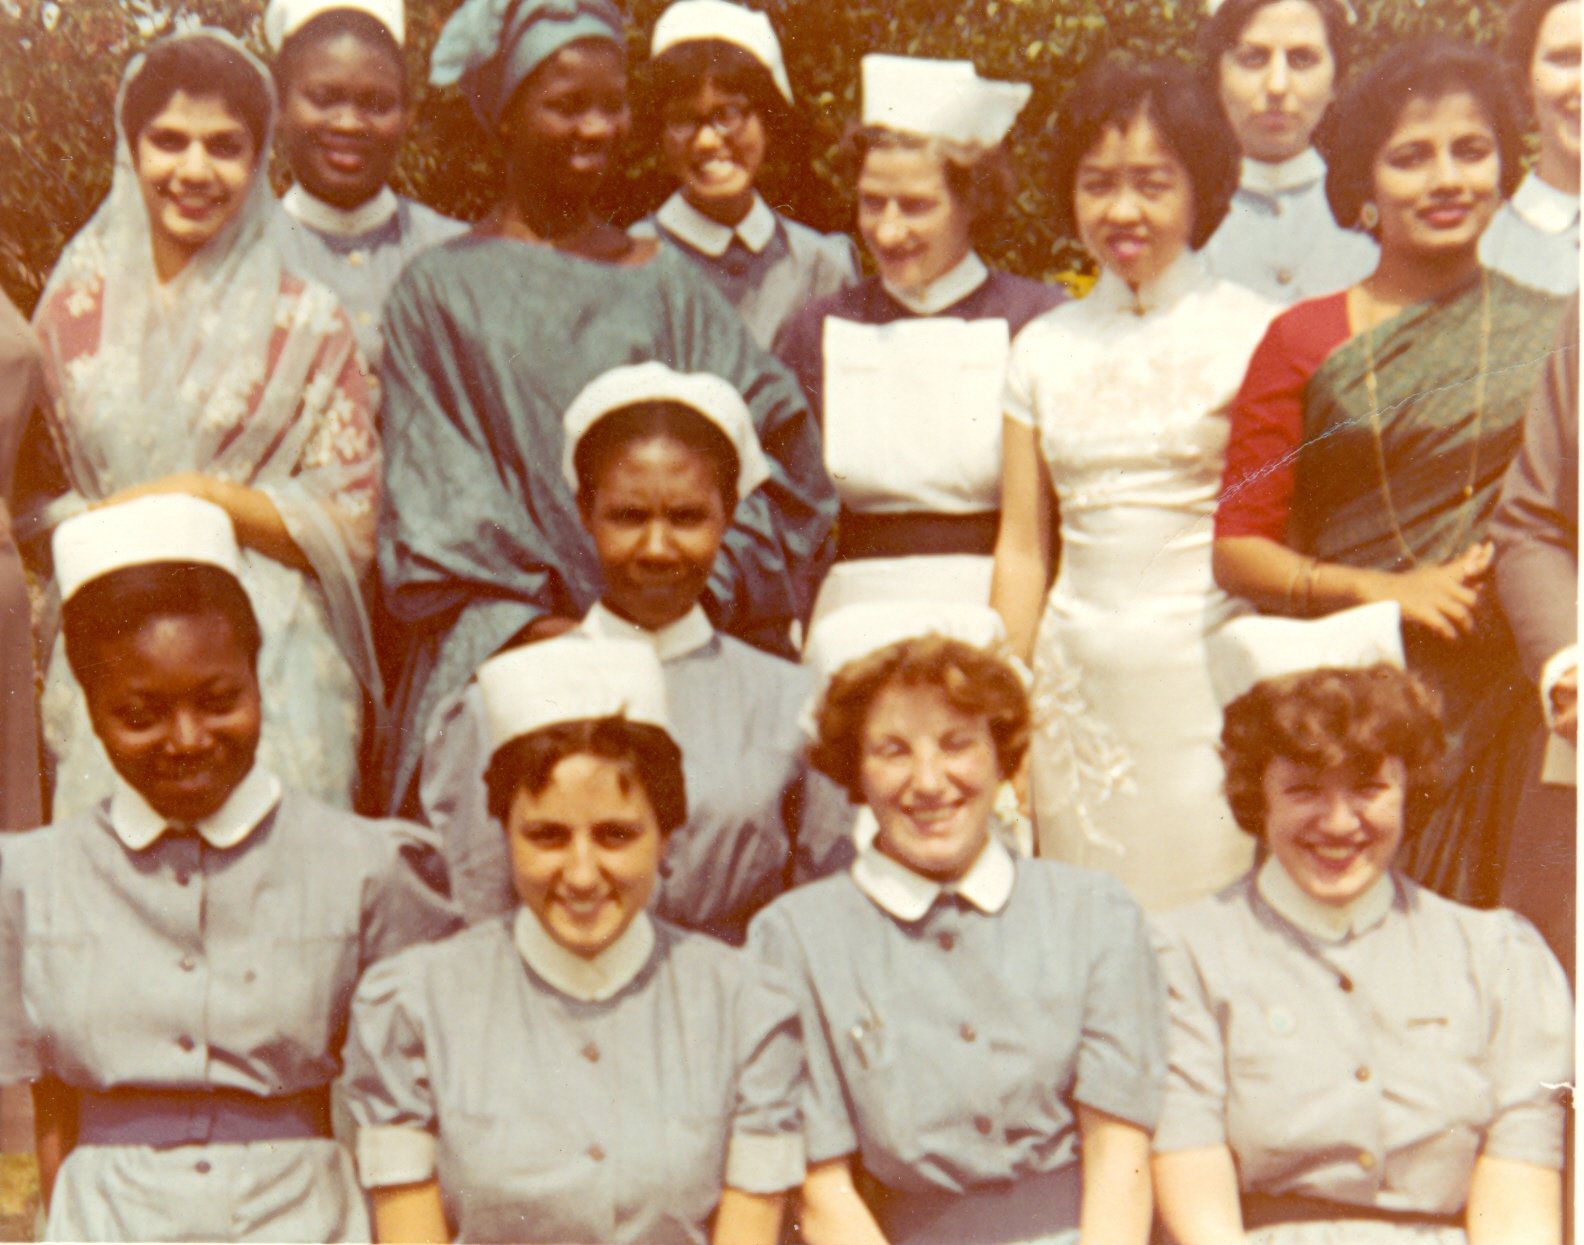 Nurses at South London Hospital in 1950